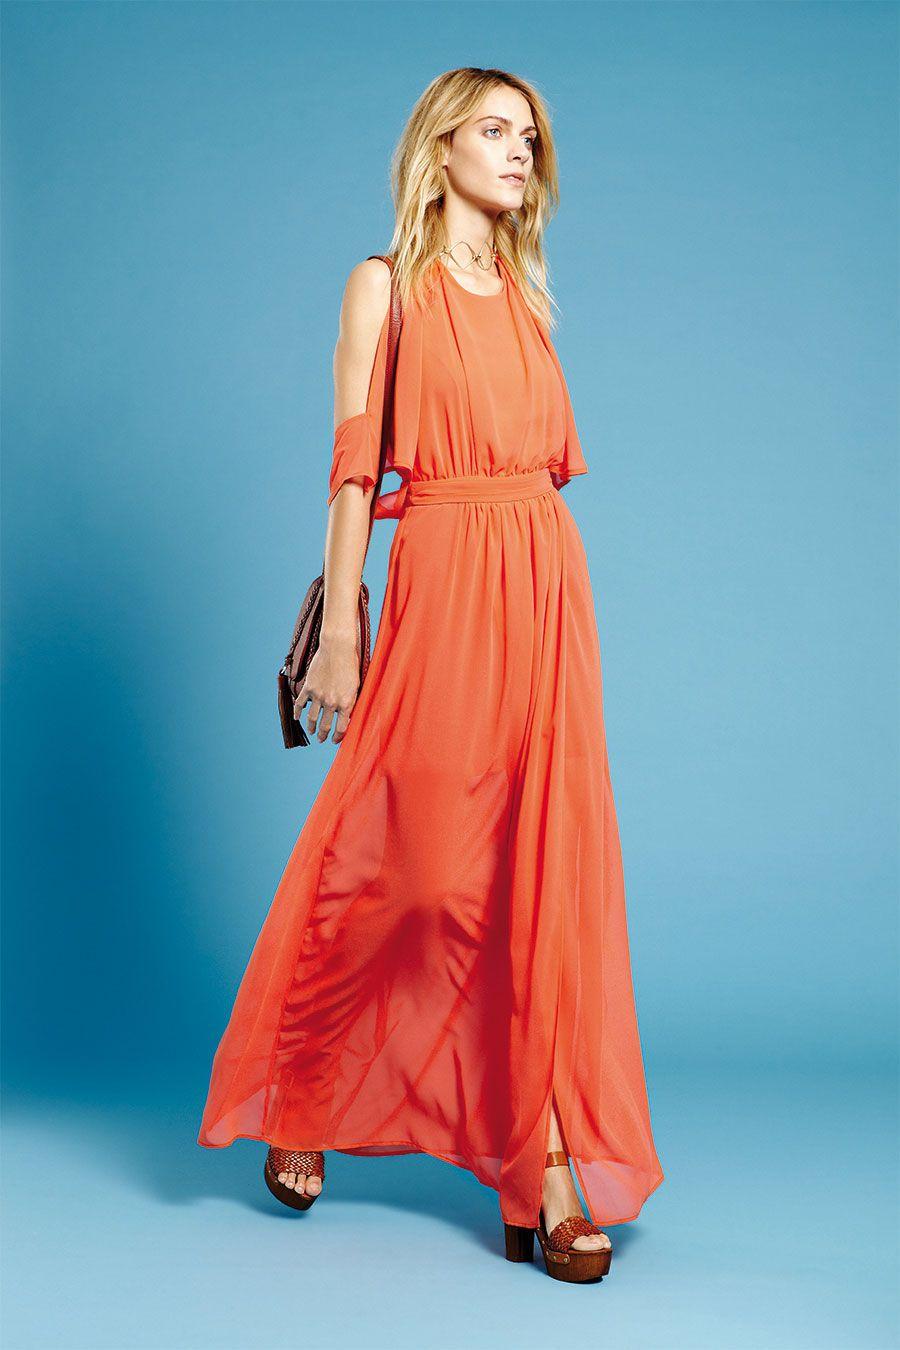 20ad7ff41910 ANNARITA N Shop Online  collezione donna